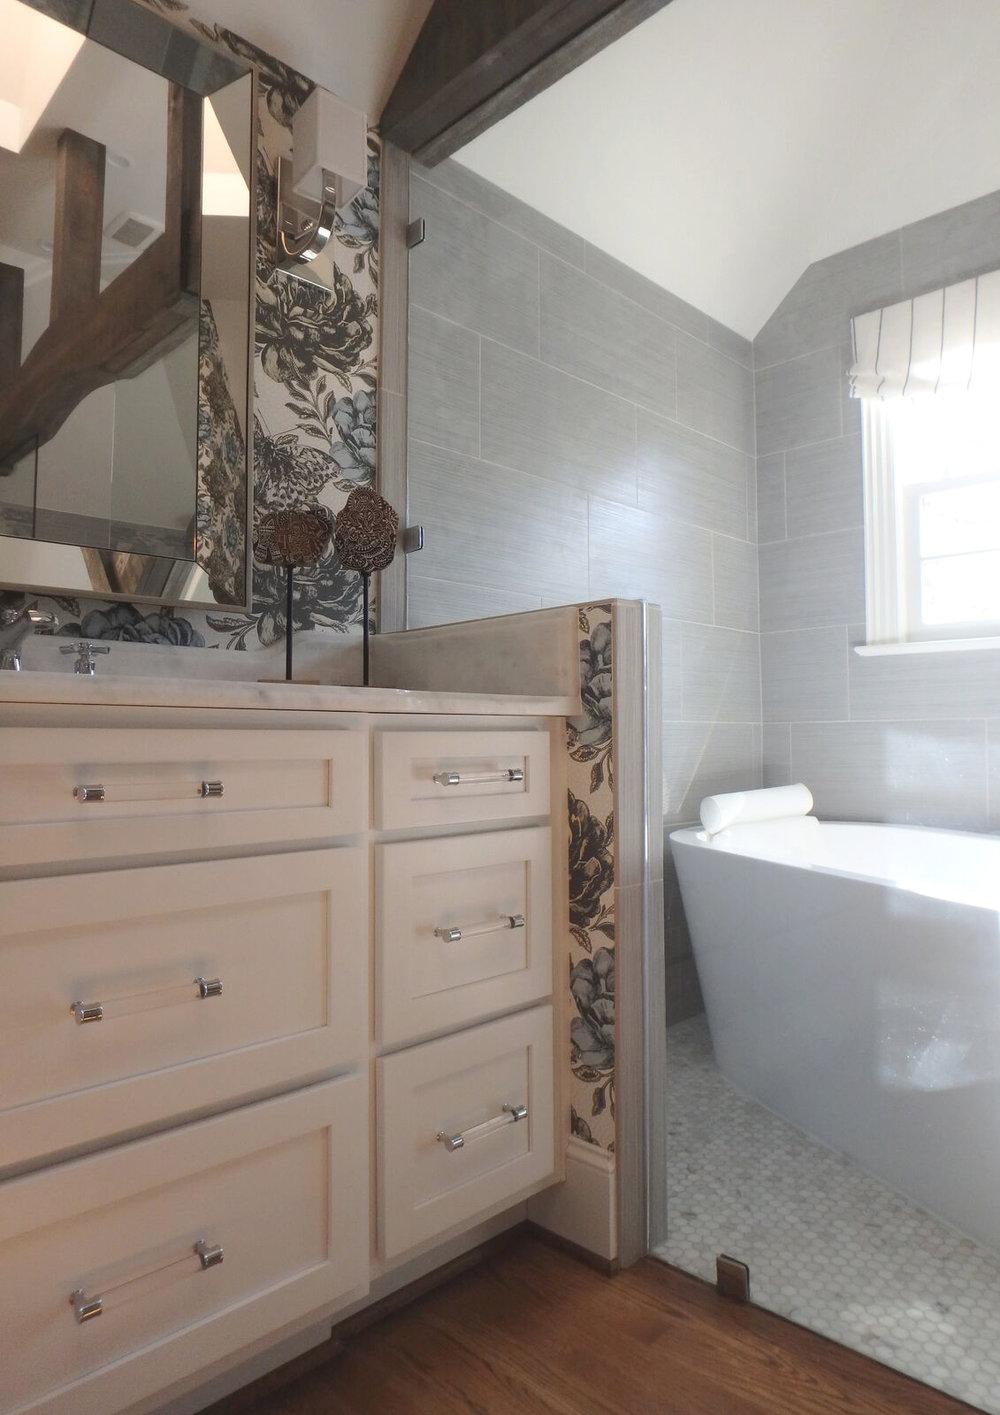 cabinets and bath.jpg